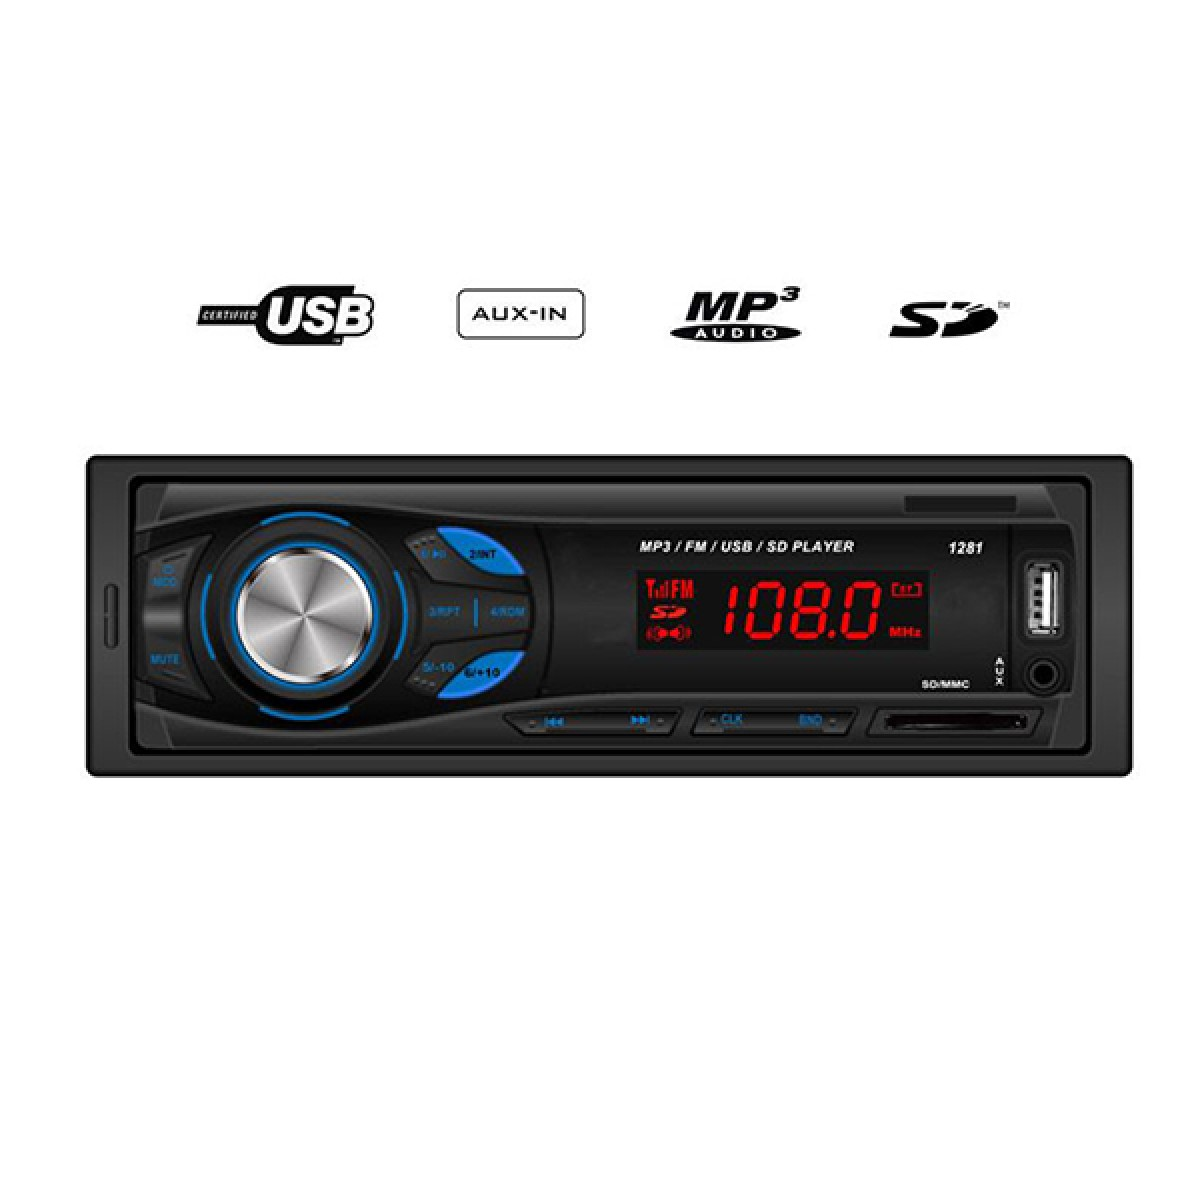 MP3 player αυτοκινήτου με είσοδο USB/SD/AUX, ραδιόφωνο και χειριστήριο - Hi-Tech GT 1281